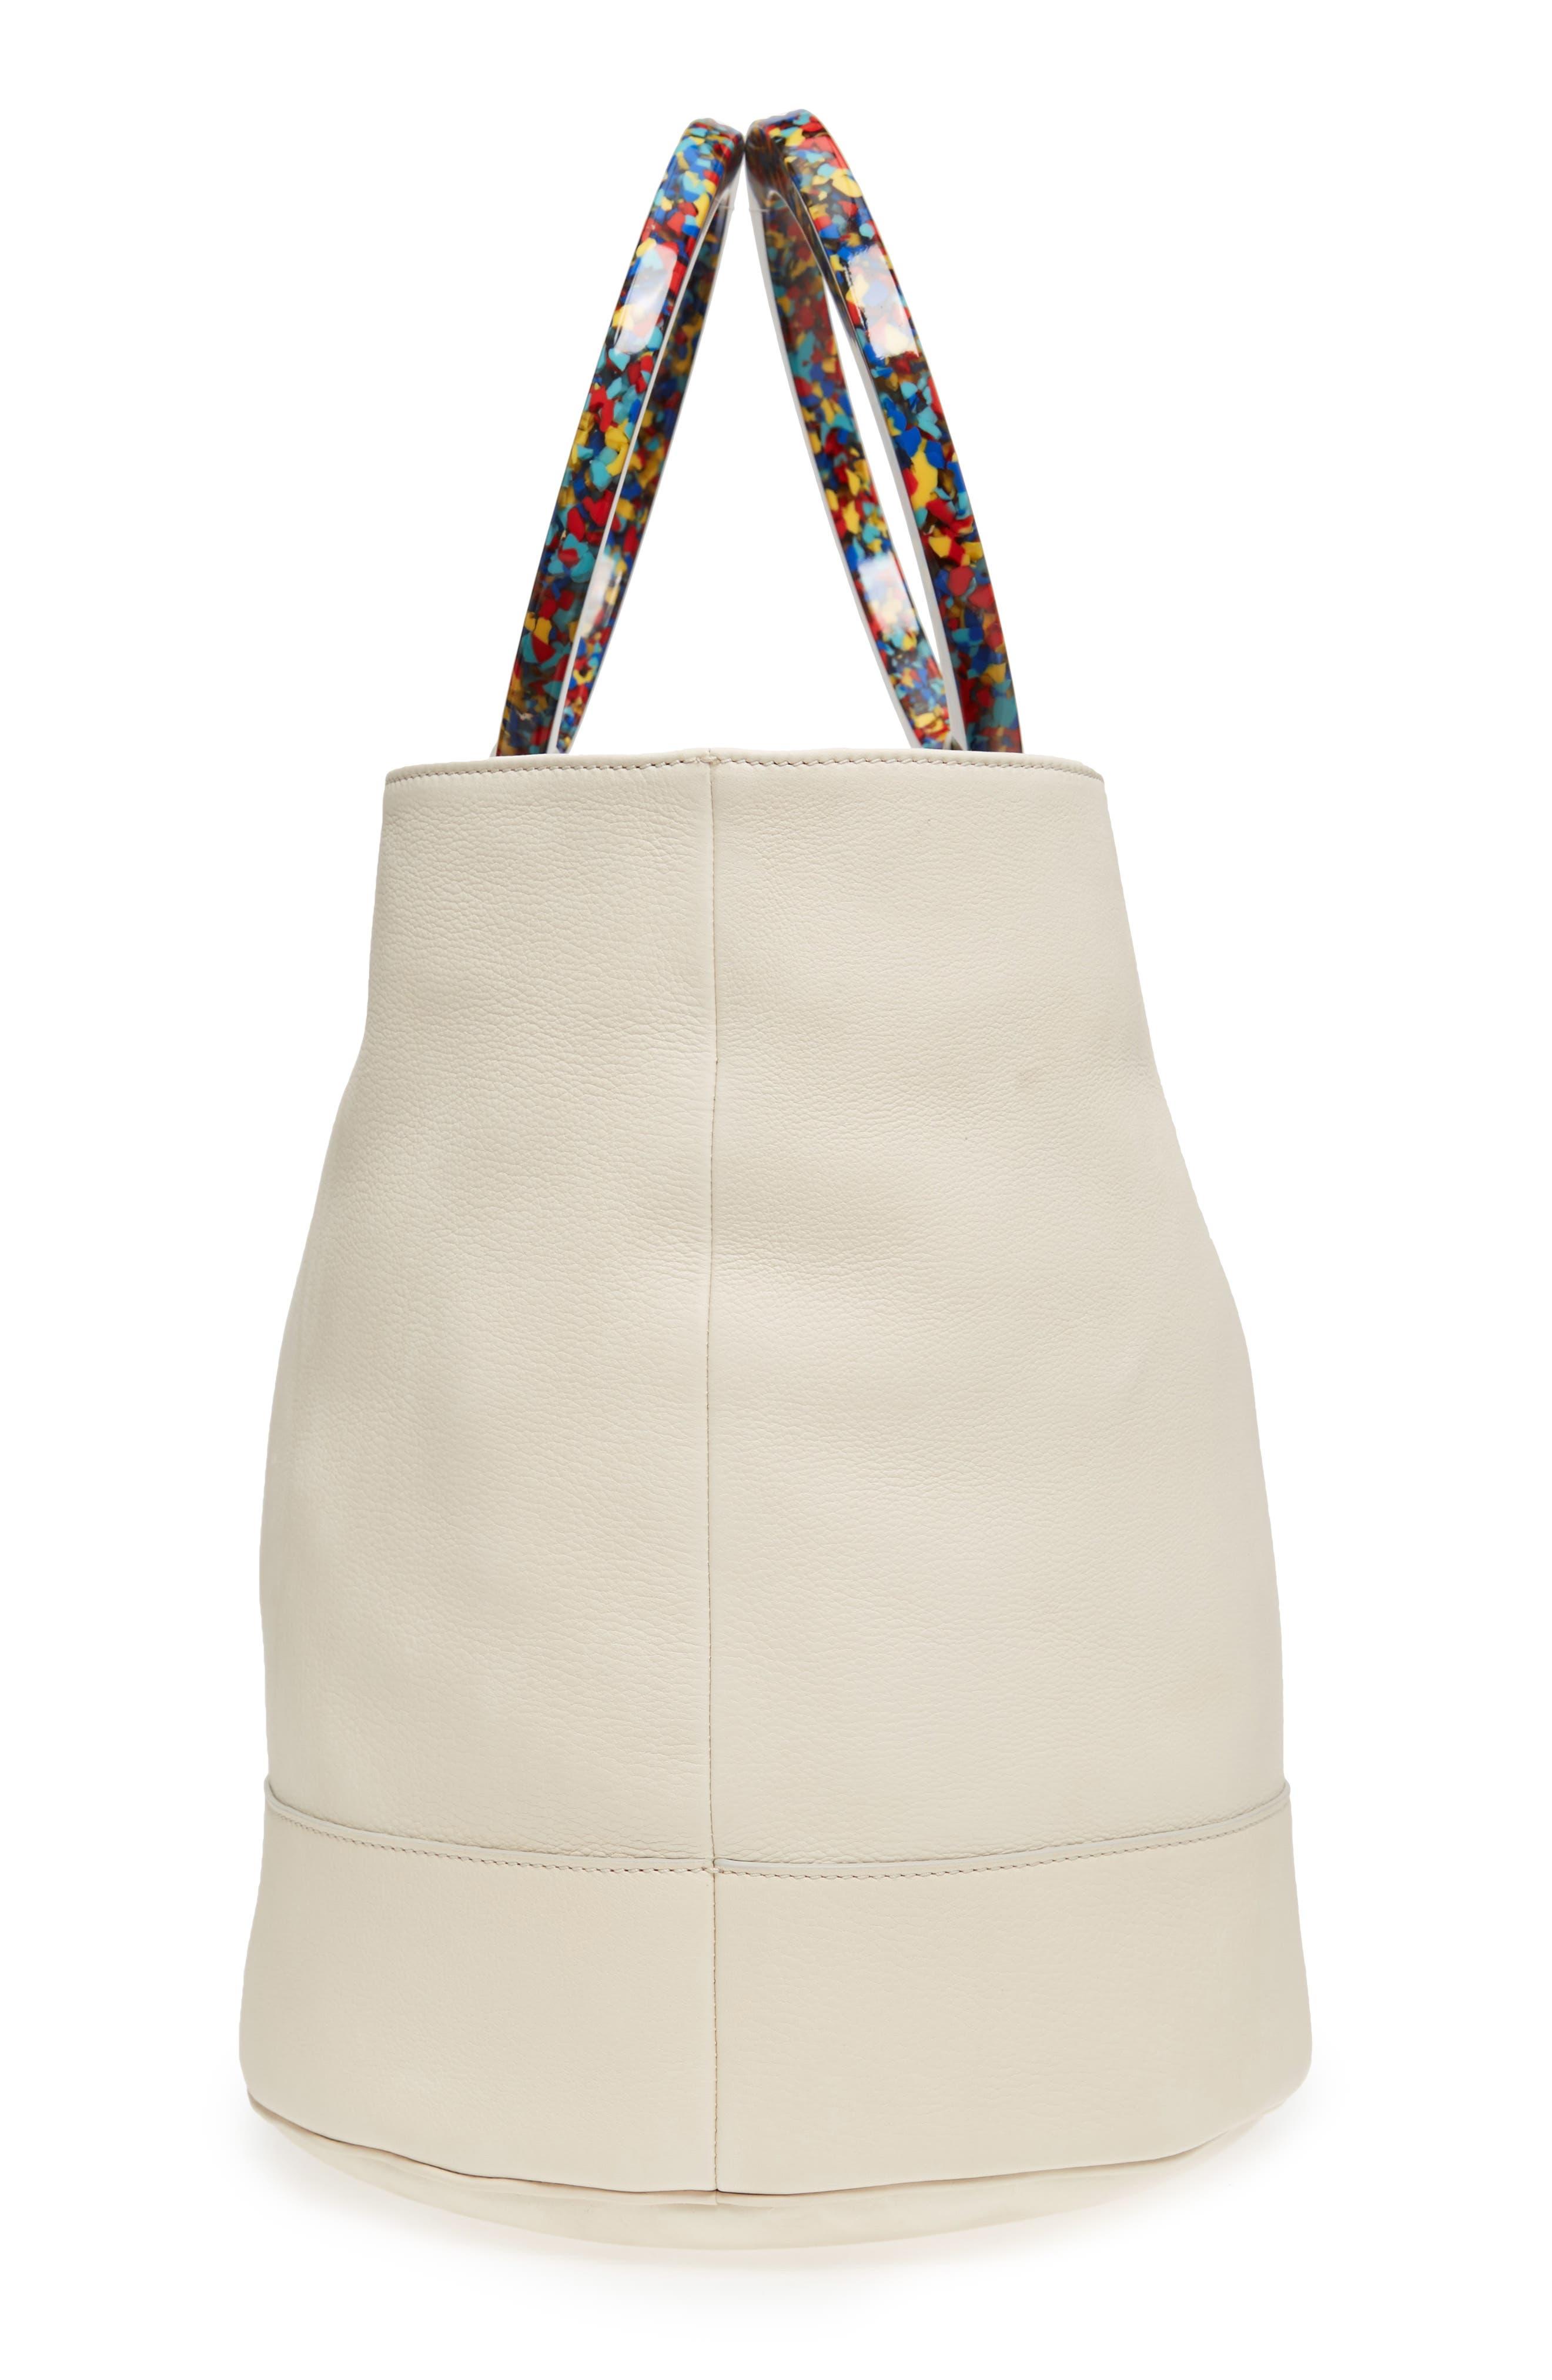 Confetti Handle Bonsai Leather Bucket Bag,                             Alternate thumbnail 5, color,                             900